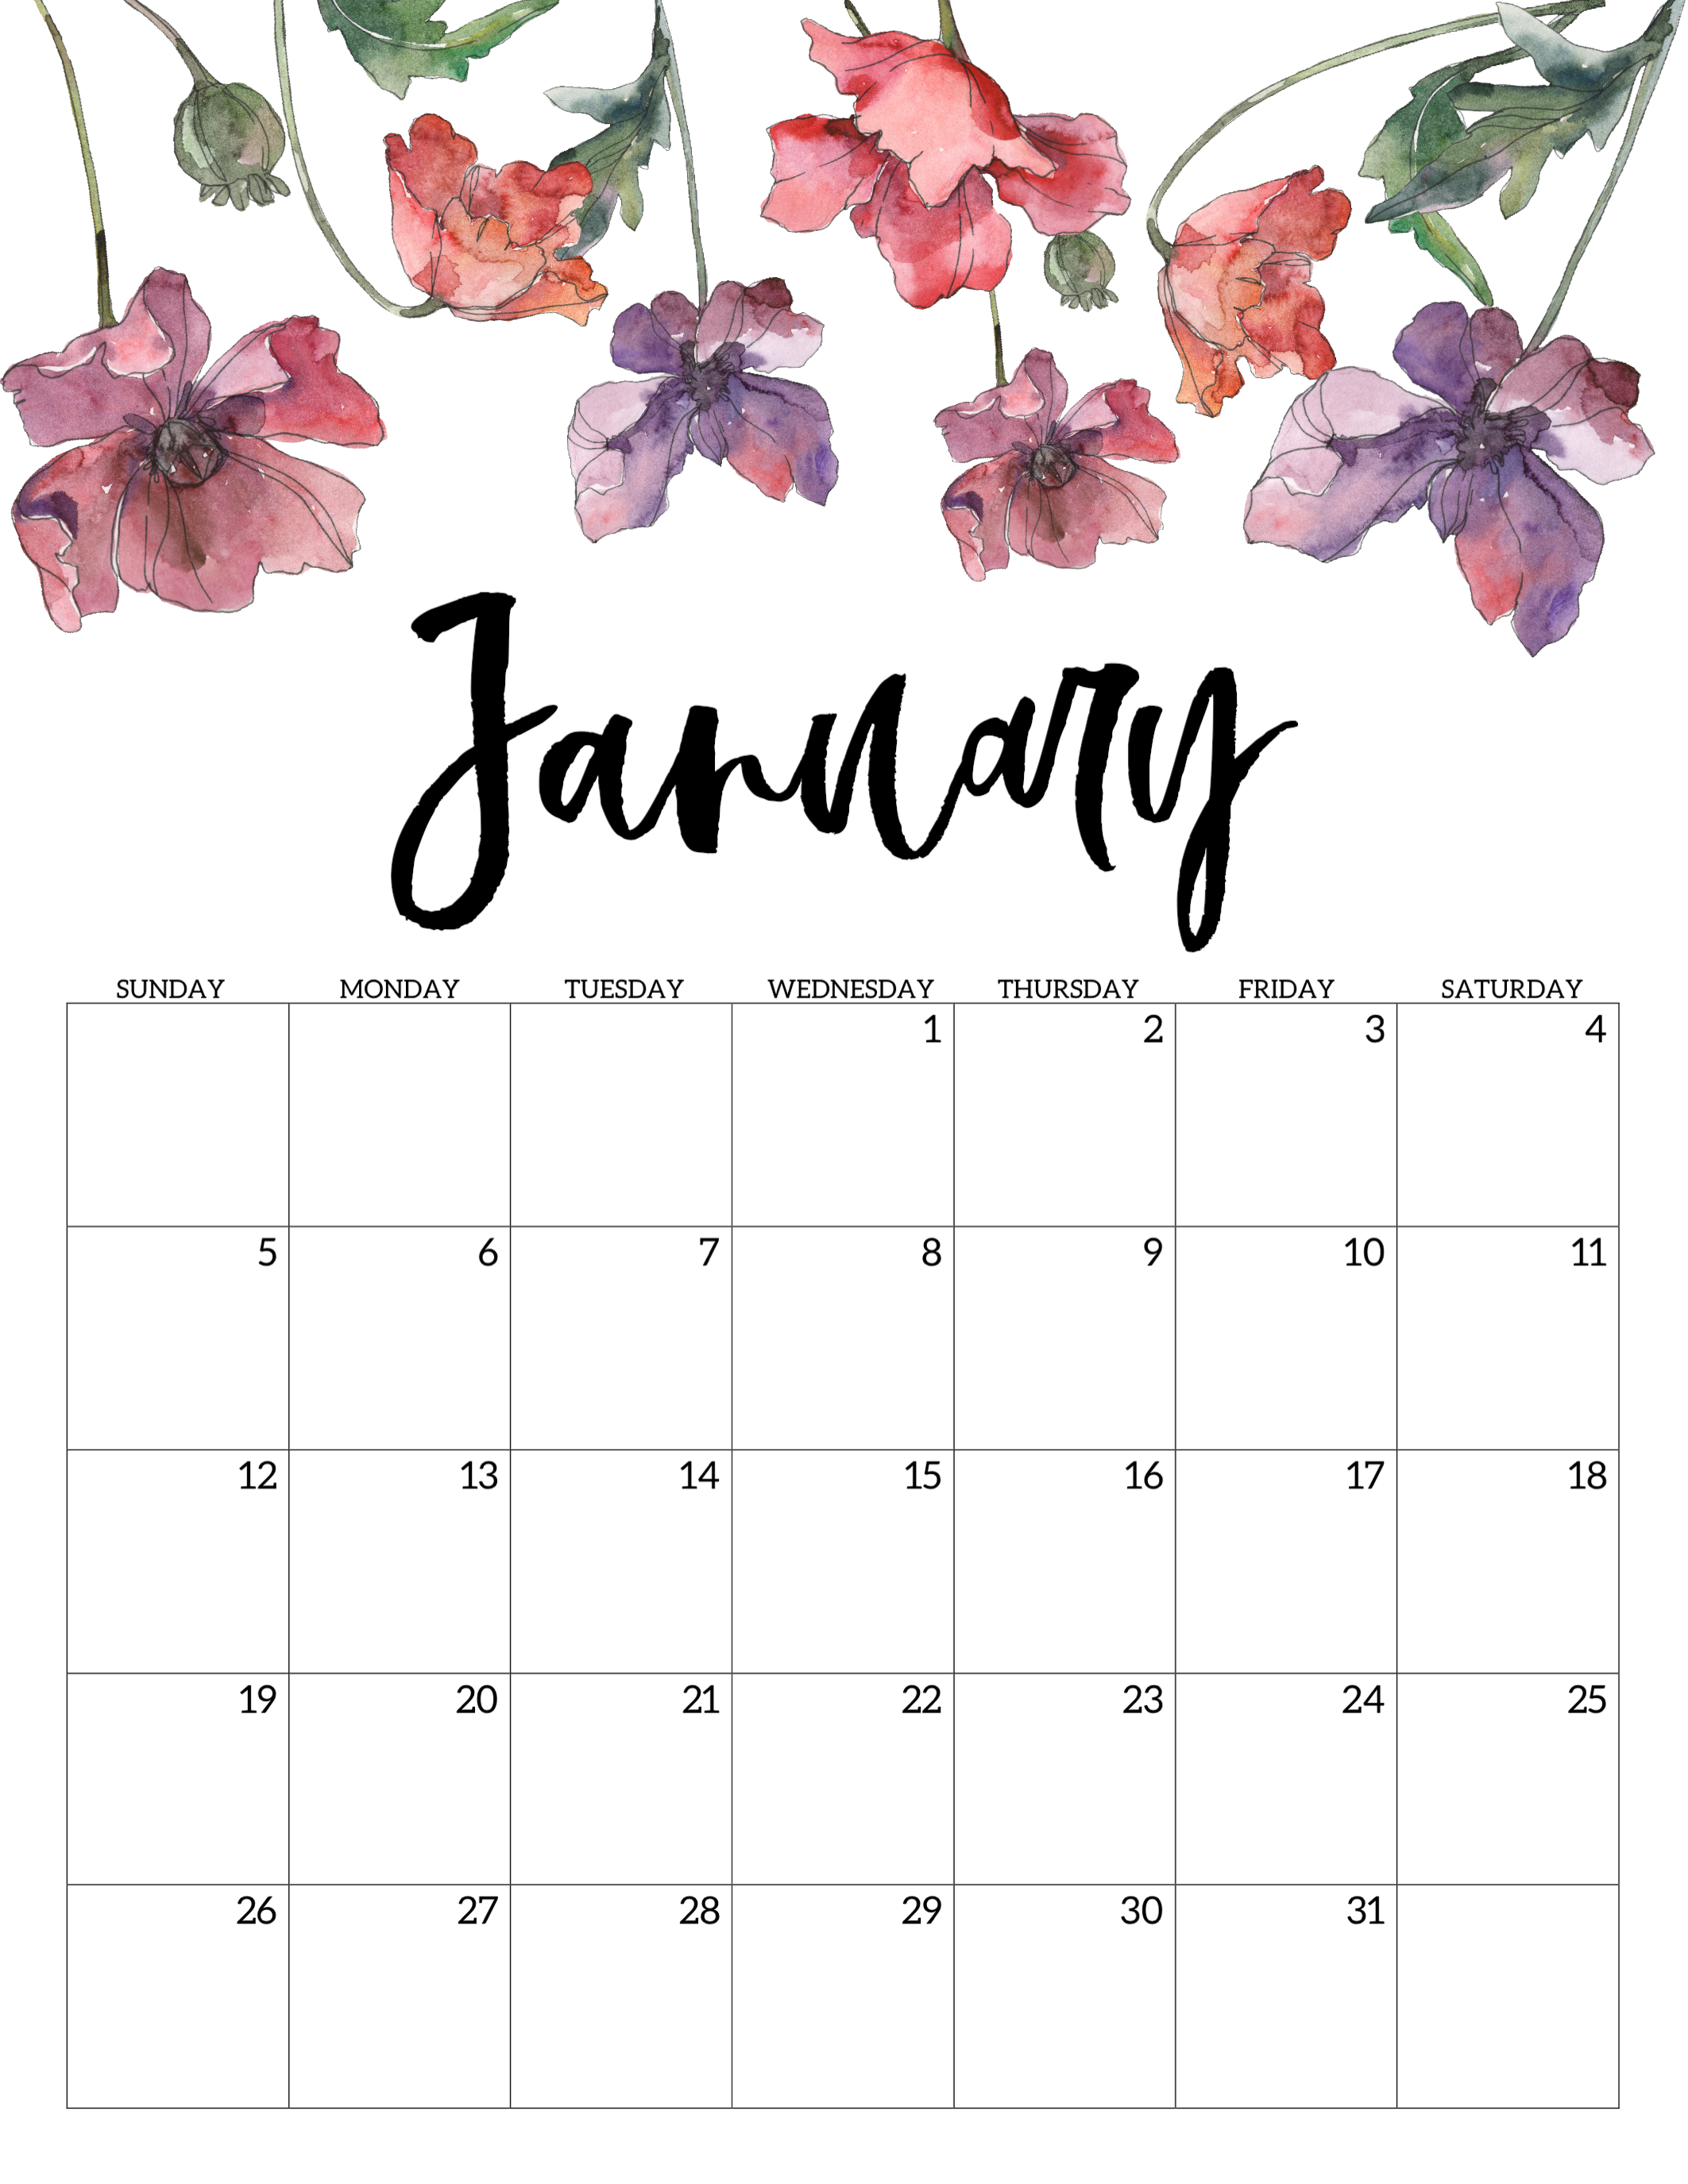 January 2020 Calendar Template.2020 Free Printable Calendar Floral Paper Trail Design